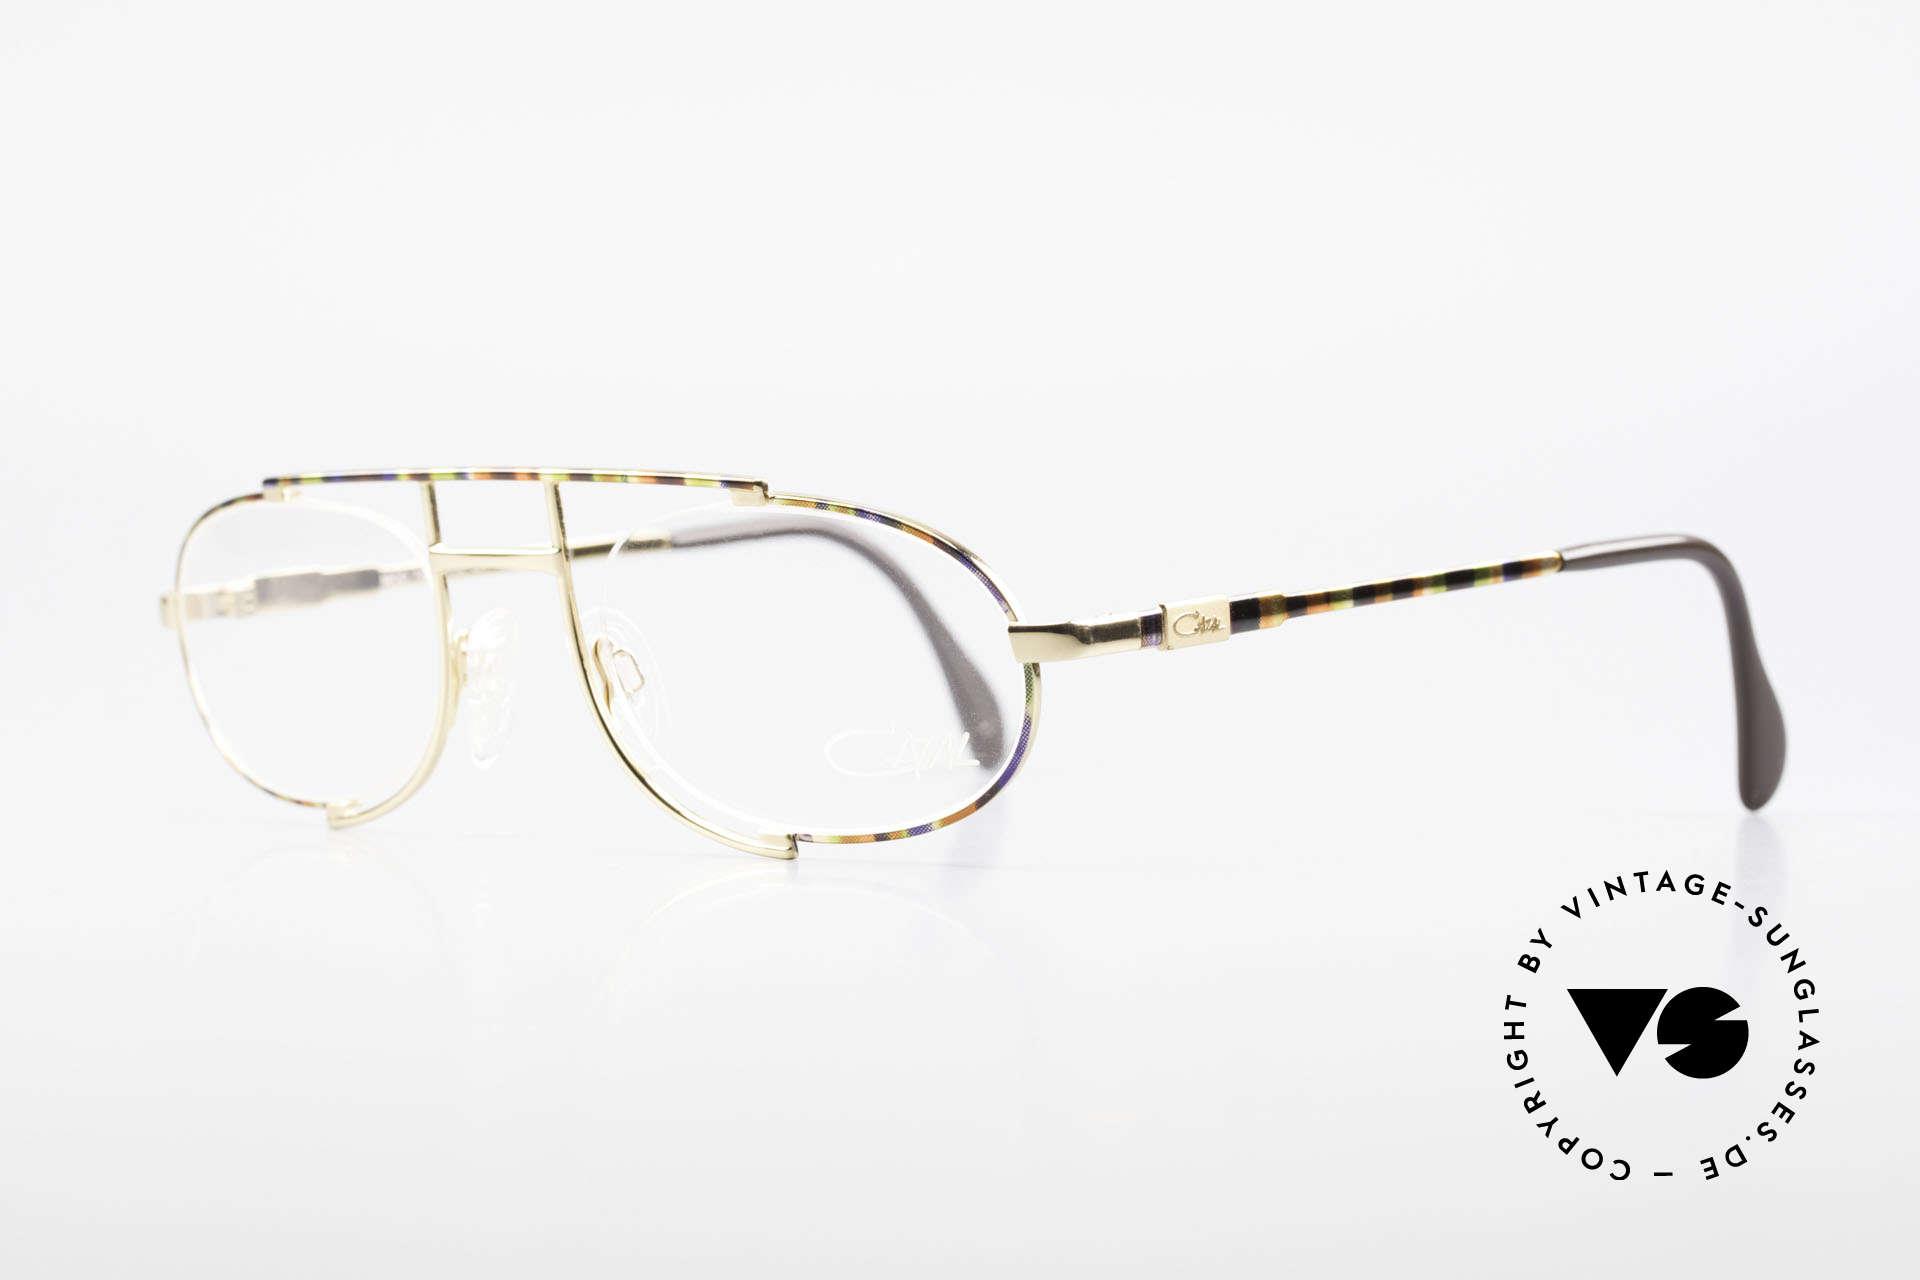 Cazal 753 Rare 1990's Designer Glasses, a true eye-catcher designed by Mr. CAri ZALloni, Made for Men